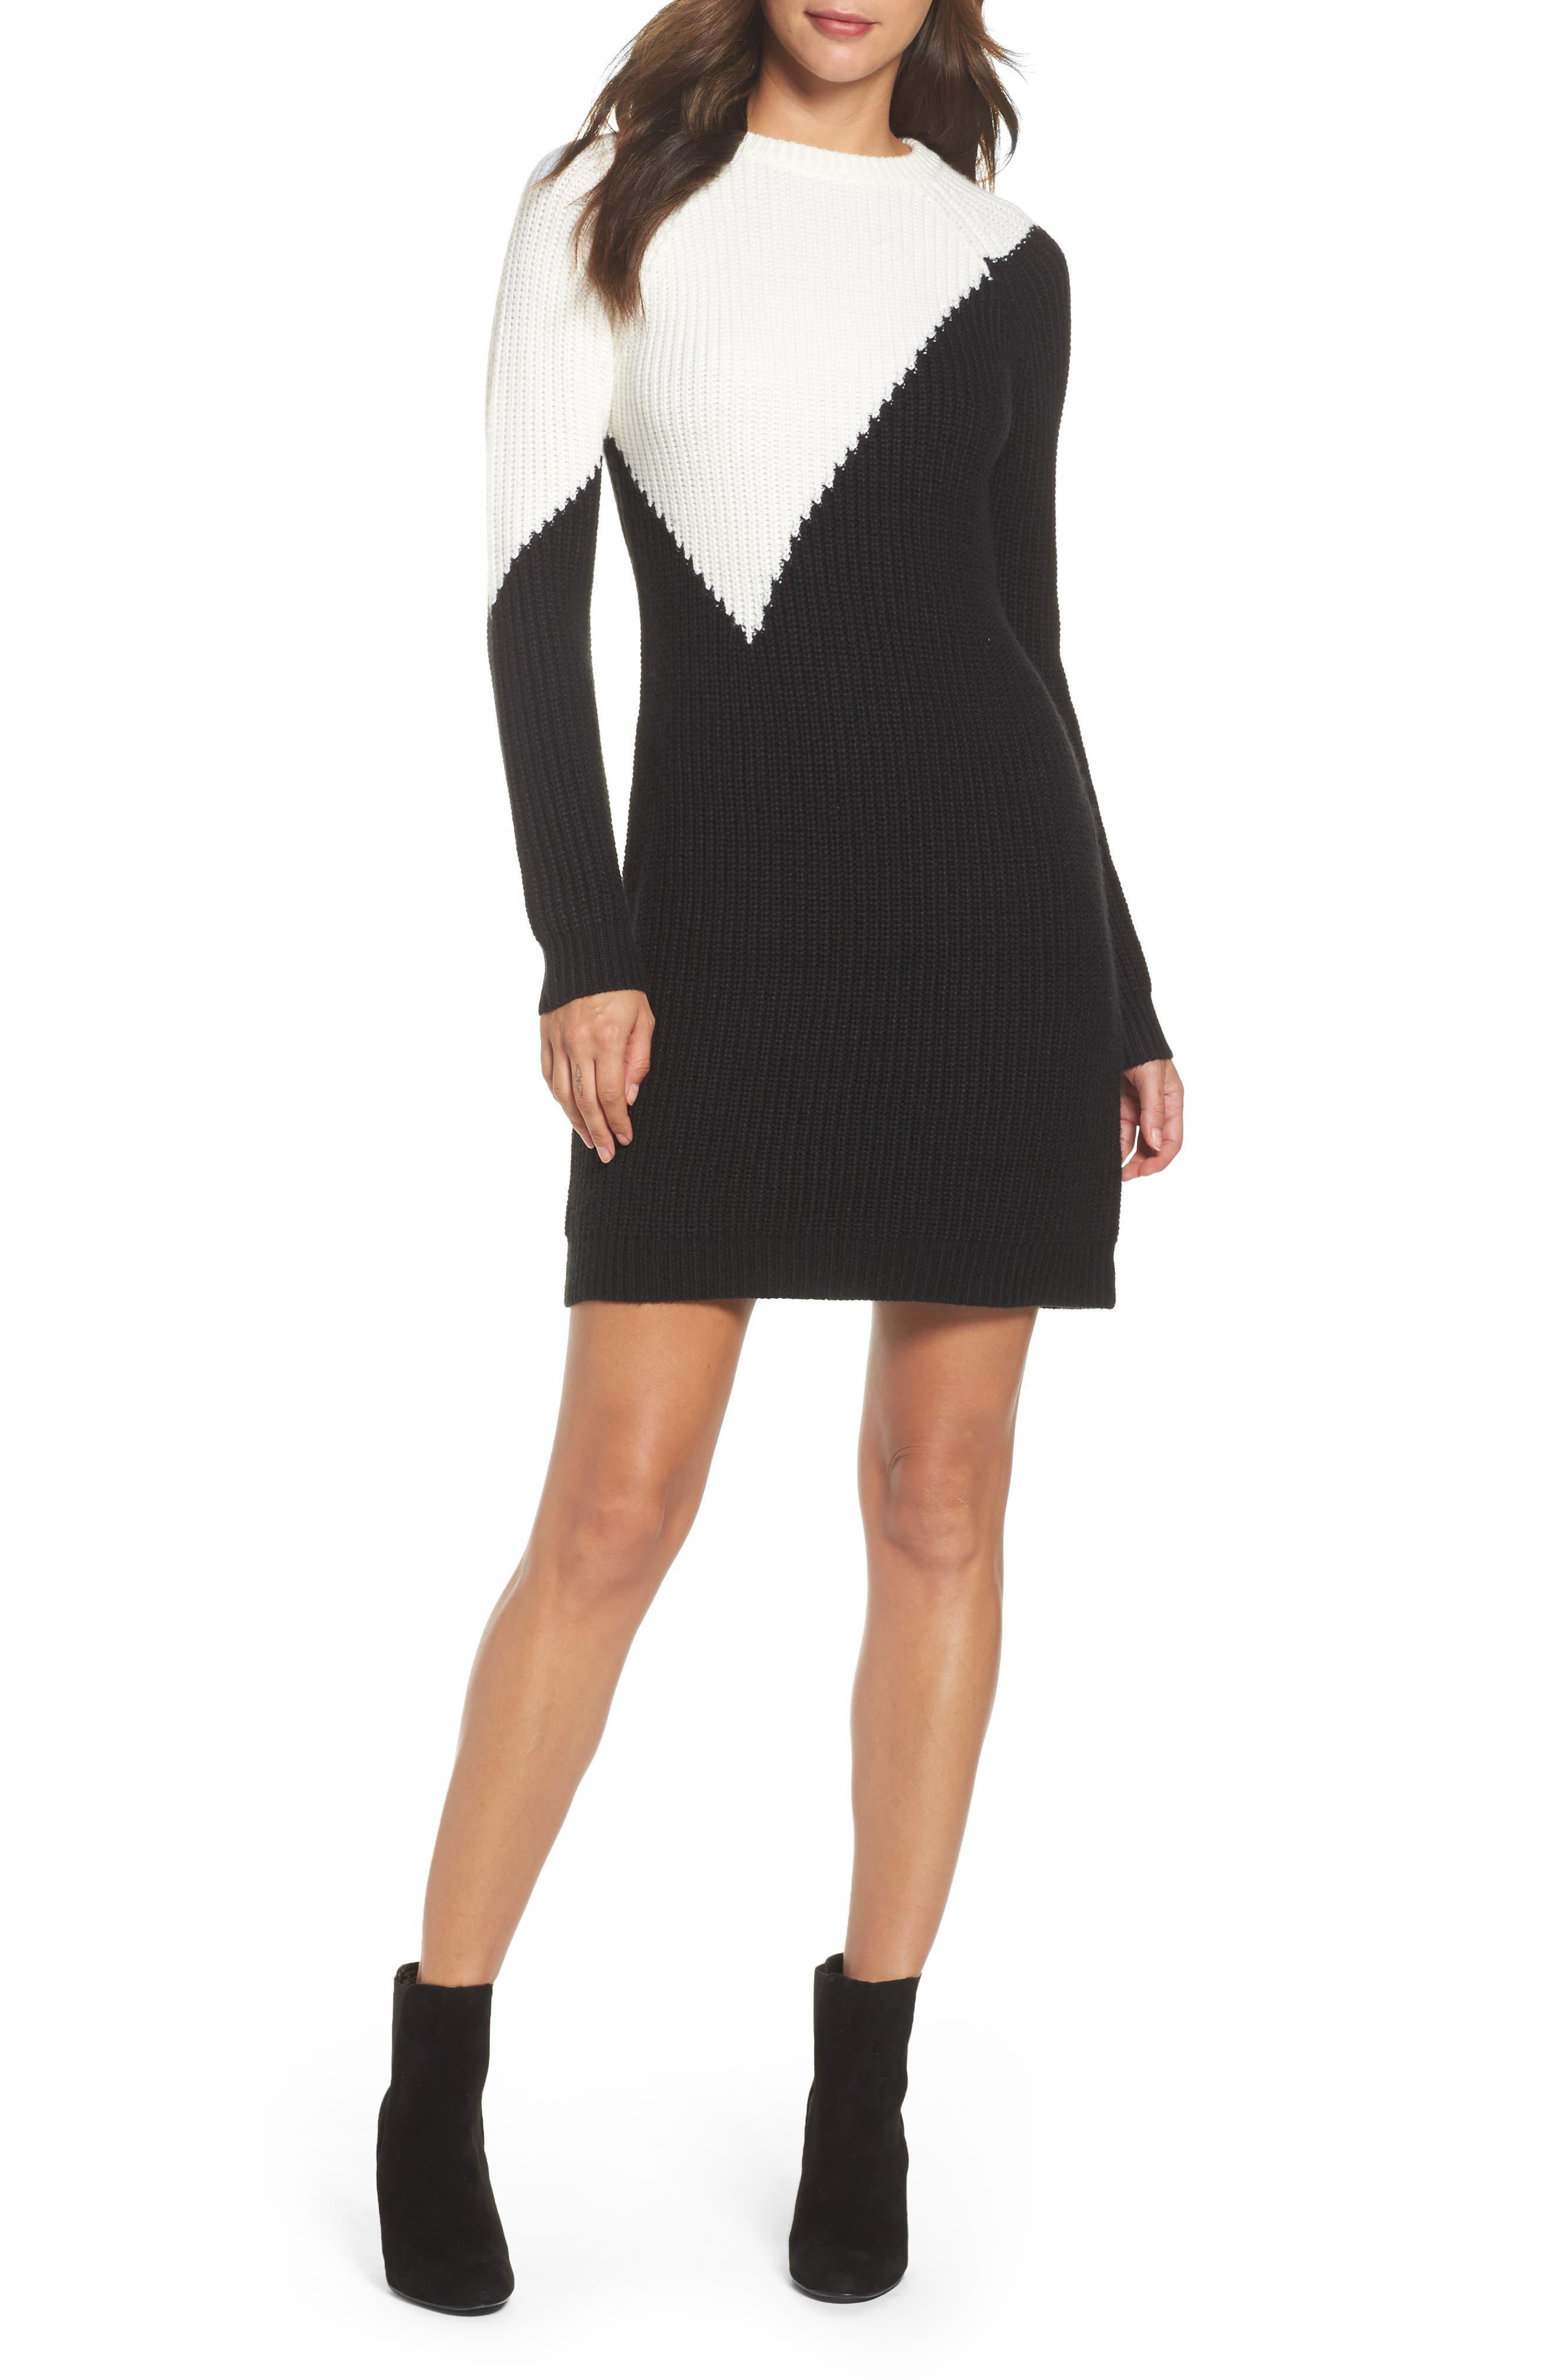 Alternate Image 1 Selected - Vince Camuto Colorblock Sweater Dress (Regular & Petite)